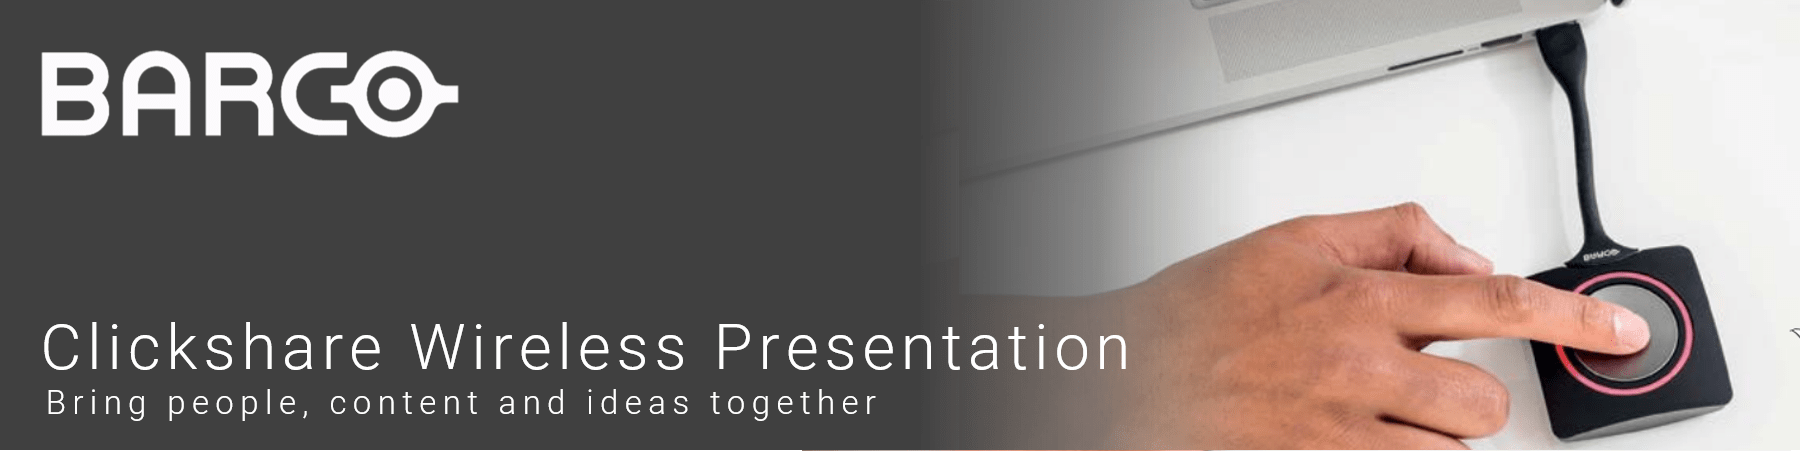 Barco ClickShare Wireless Presentation